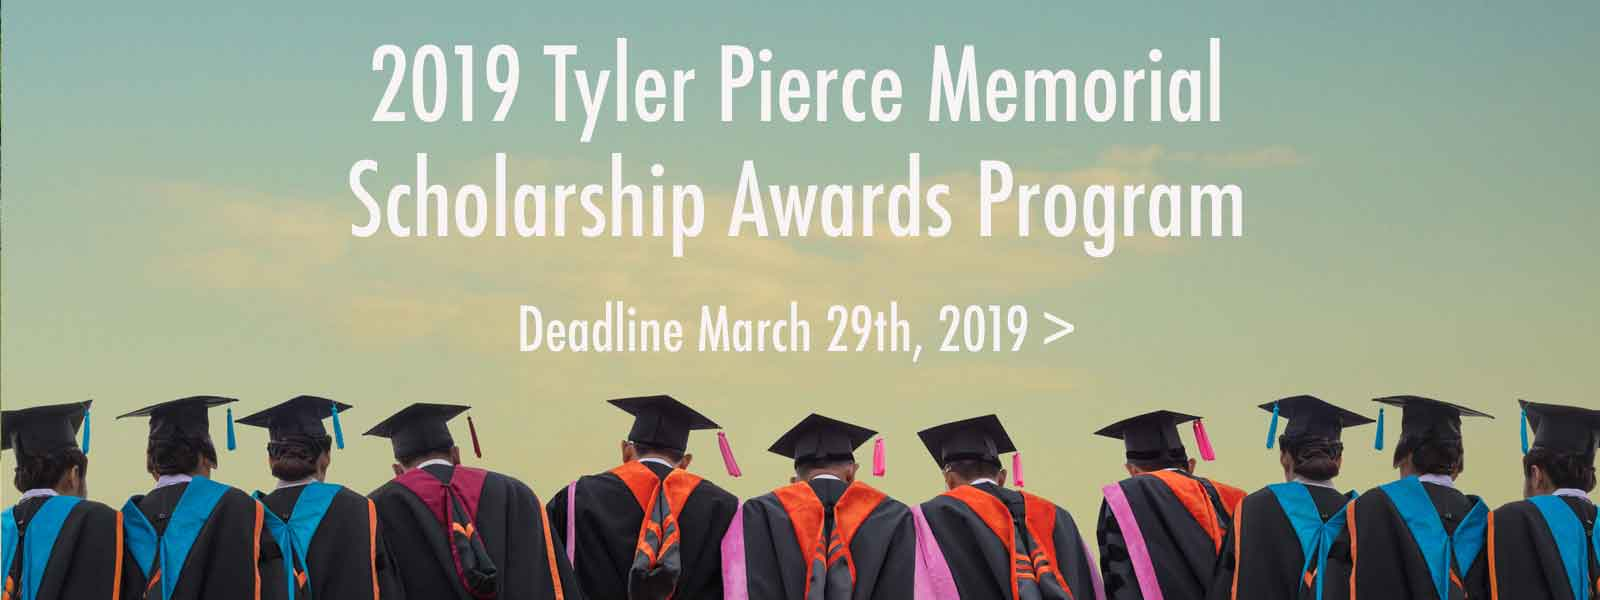 TylersTEAM_Scholarships